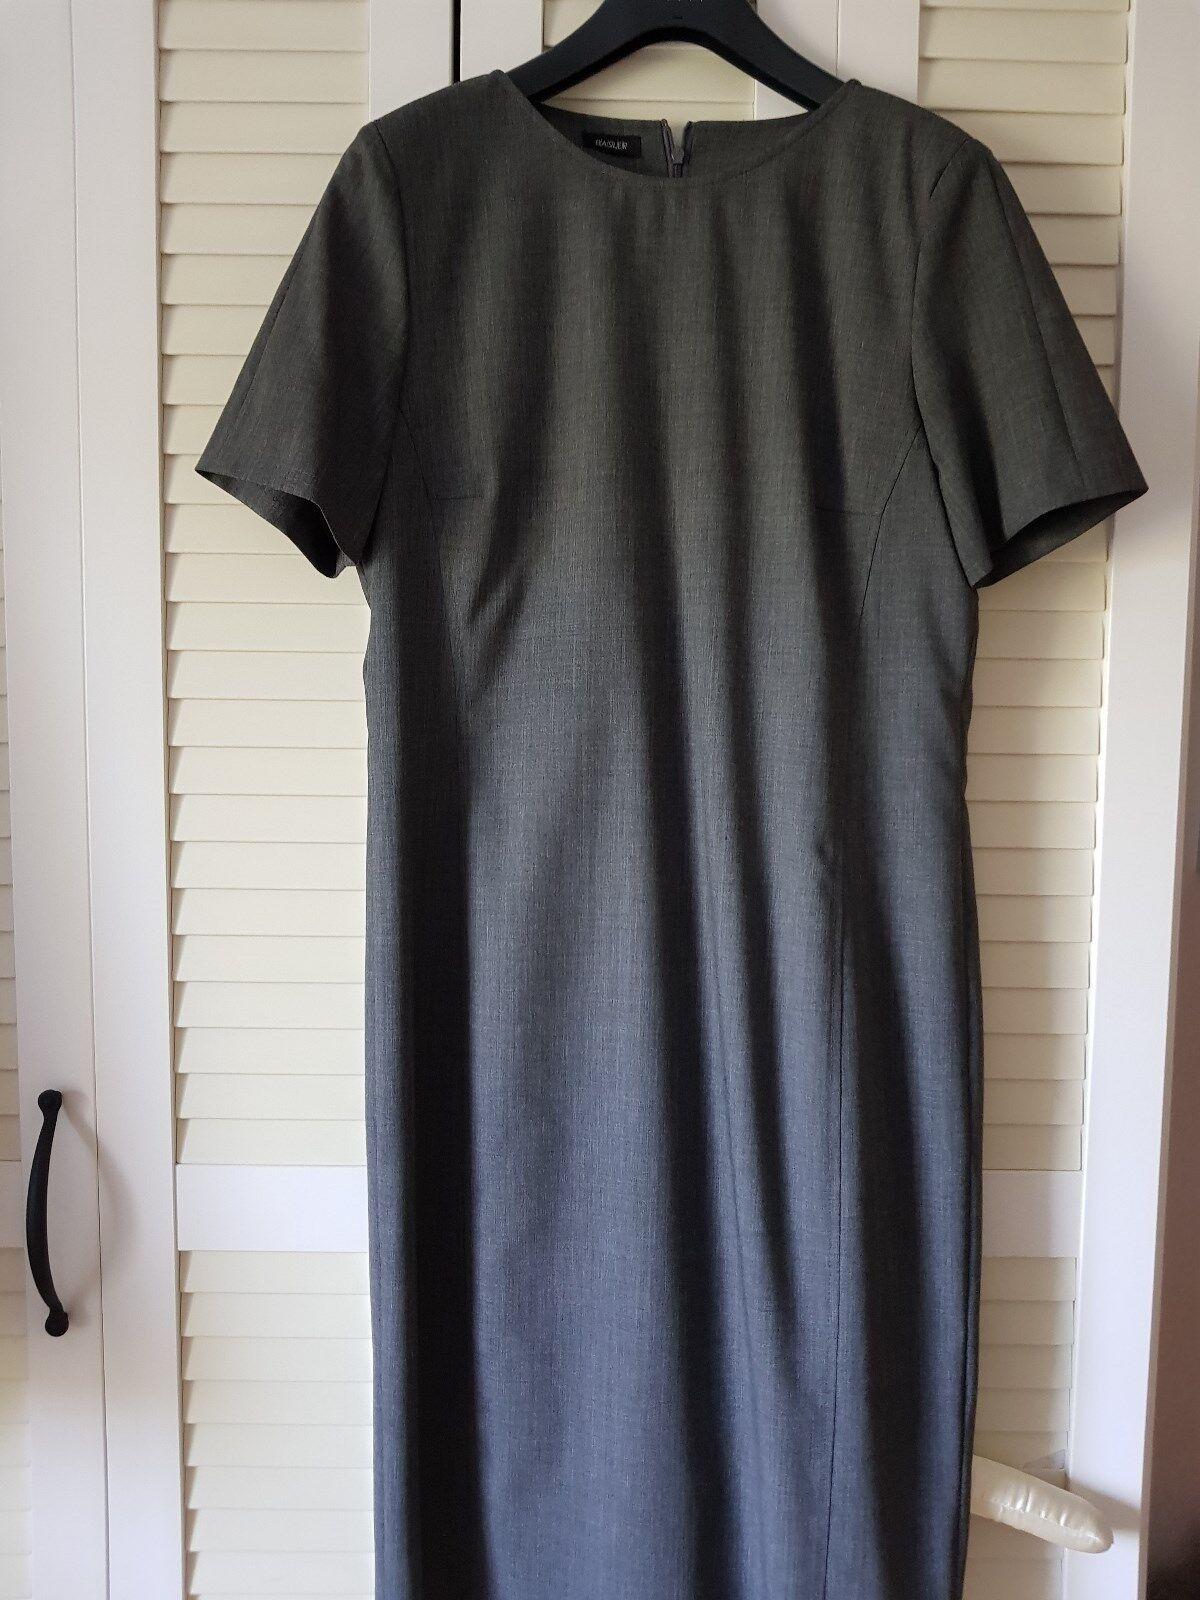 Etui Kleid von Basler Grau Edel Business Wolle Gr.38 NEU traumhaft